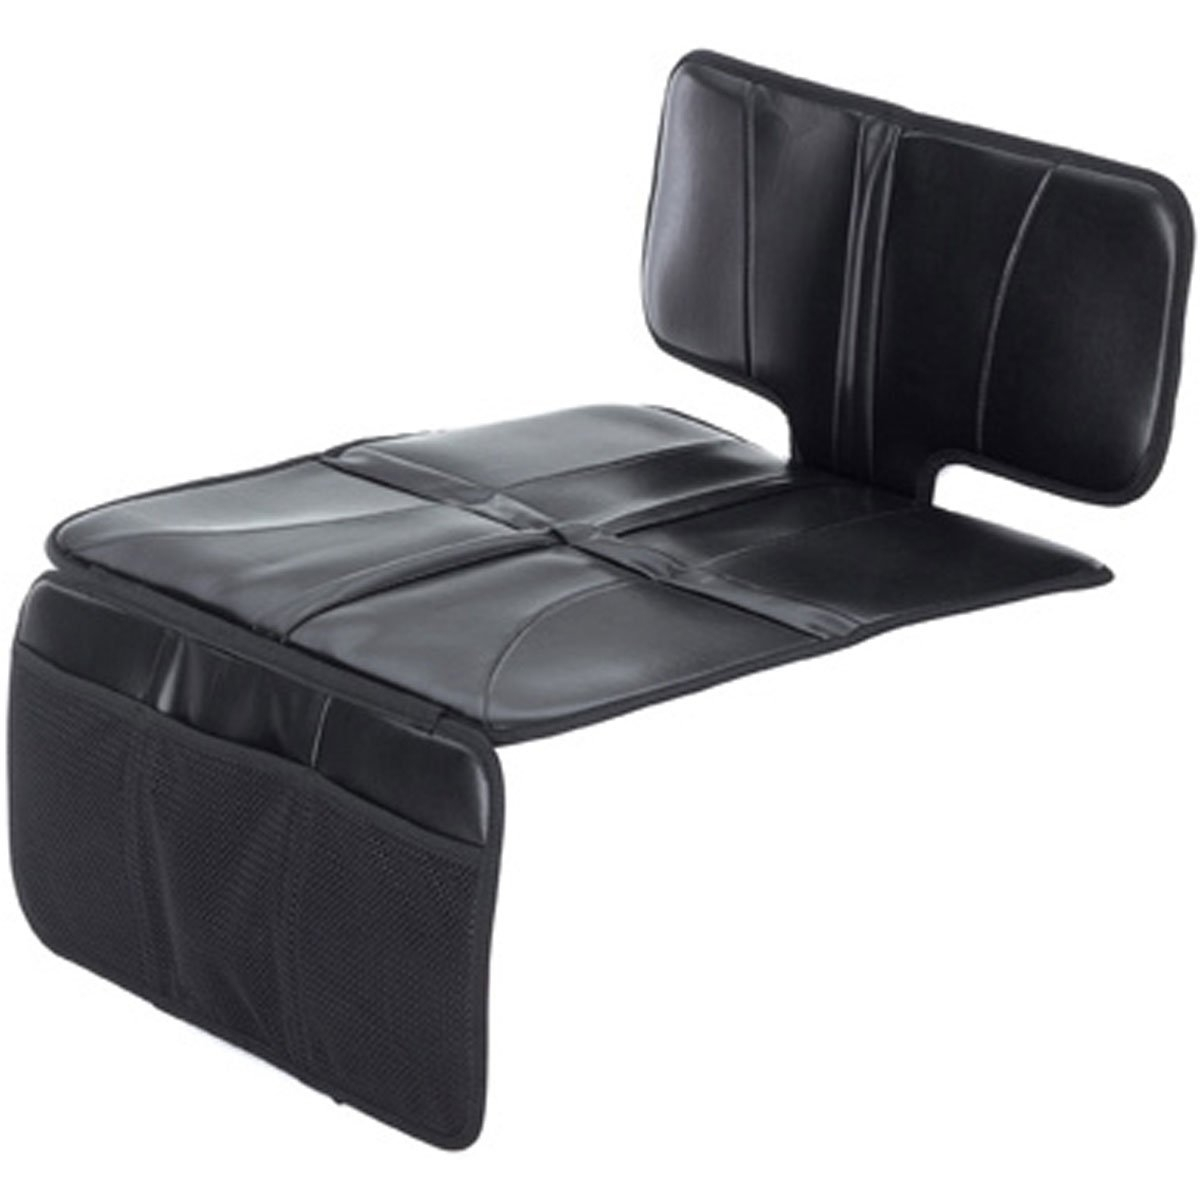 r mer sitzschutz sitzschoner kindersitzunterlage f r alle kindersitze neu 5870 ebay. Black Bedroom Furniture Sets. Home Design Ideas